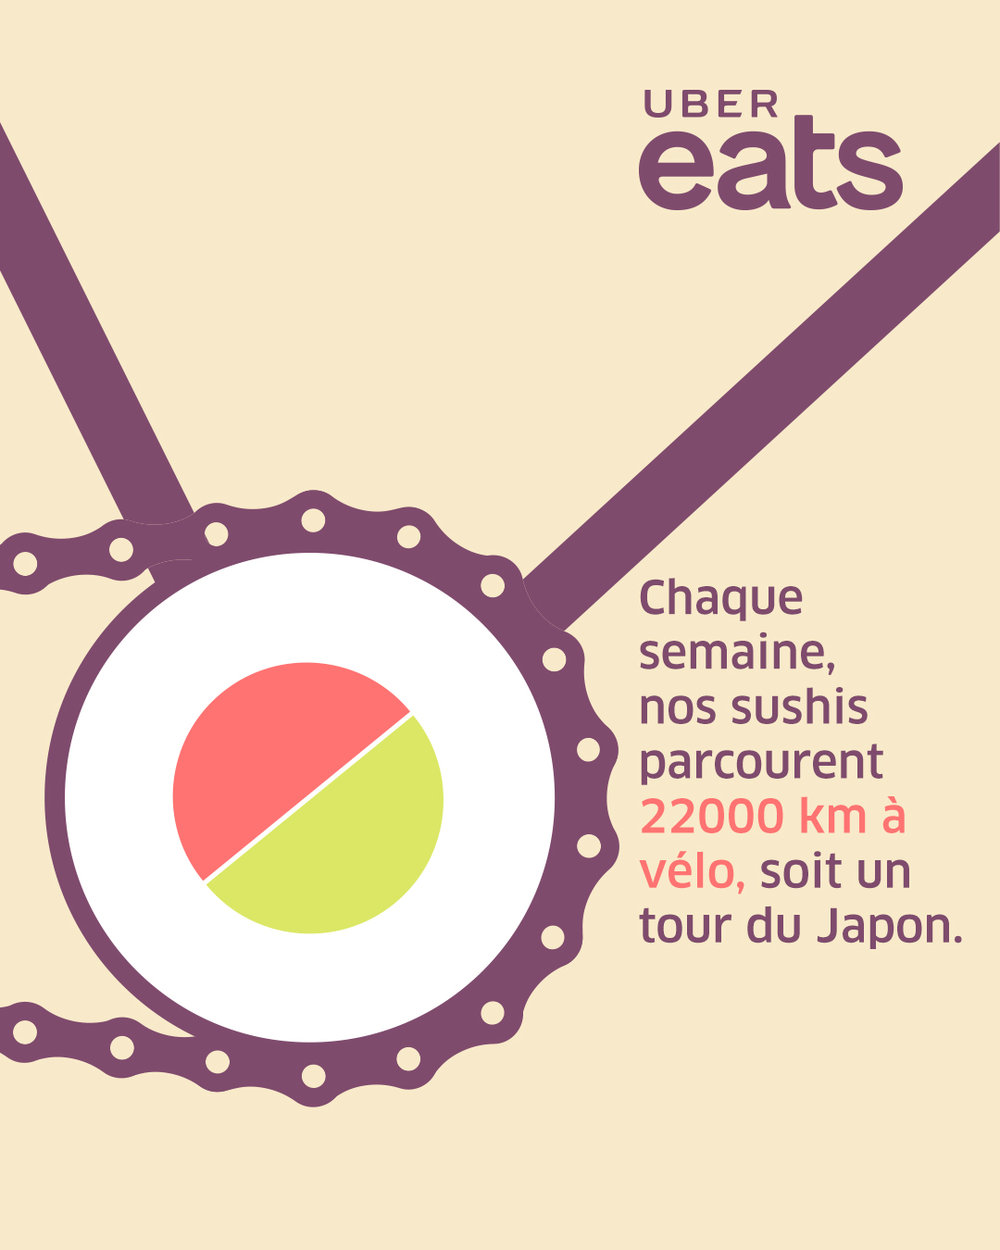 UBEREATS-1080x1350-sushis-FR.jpg